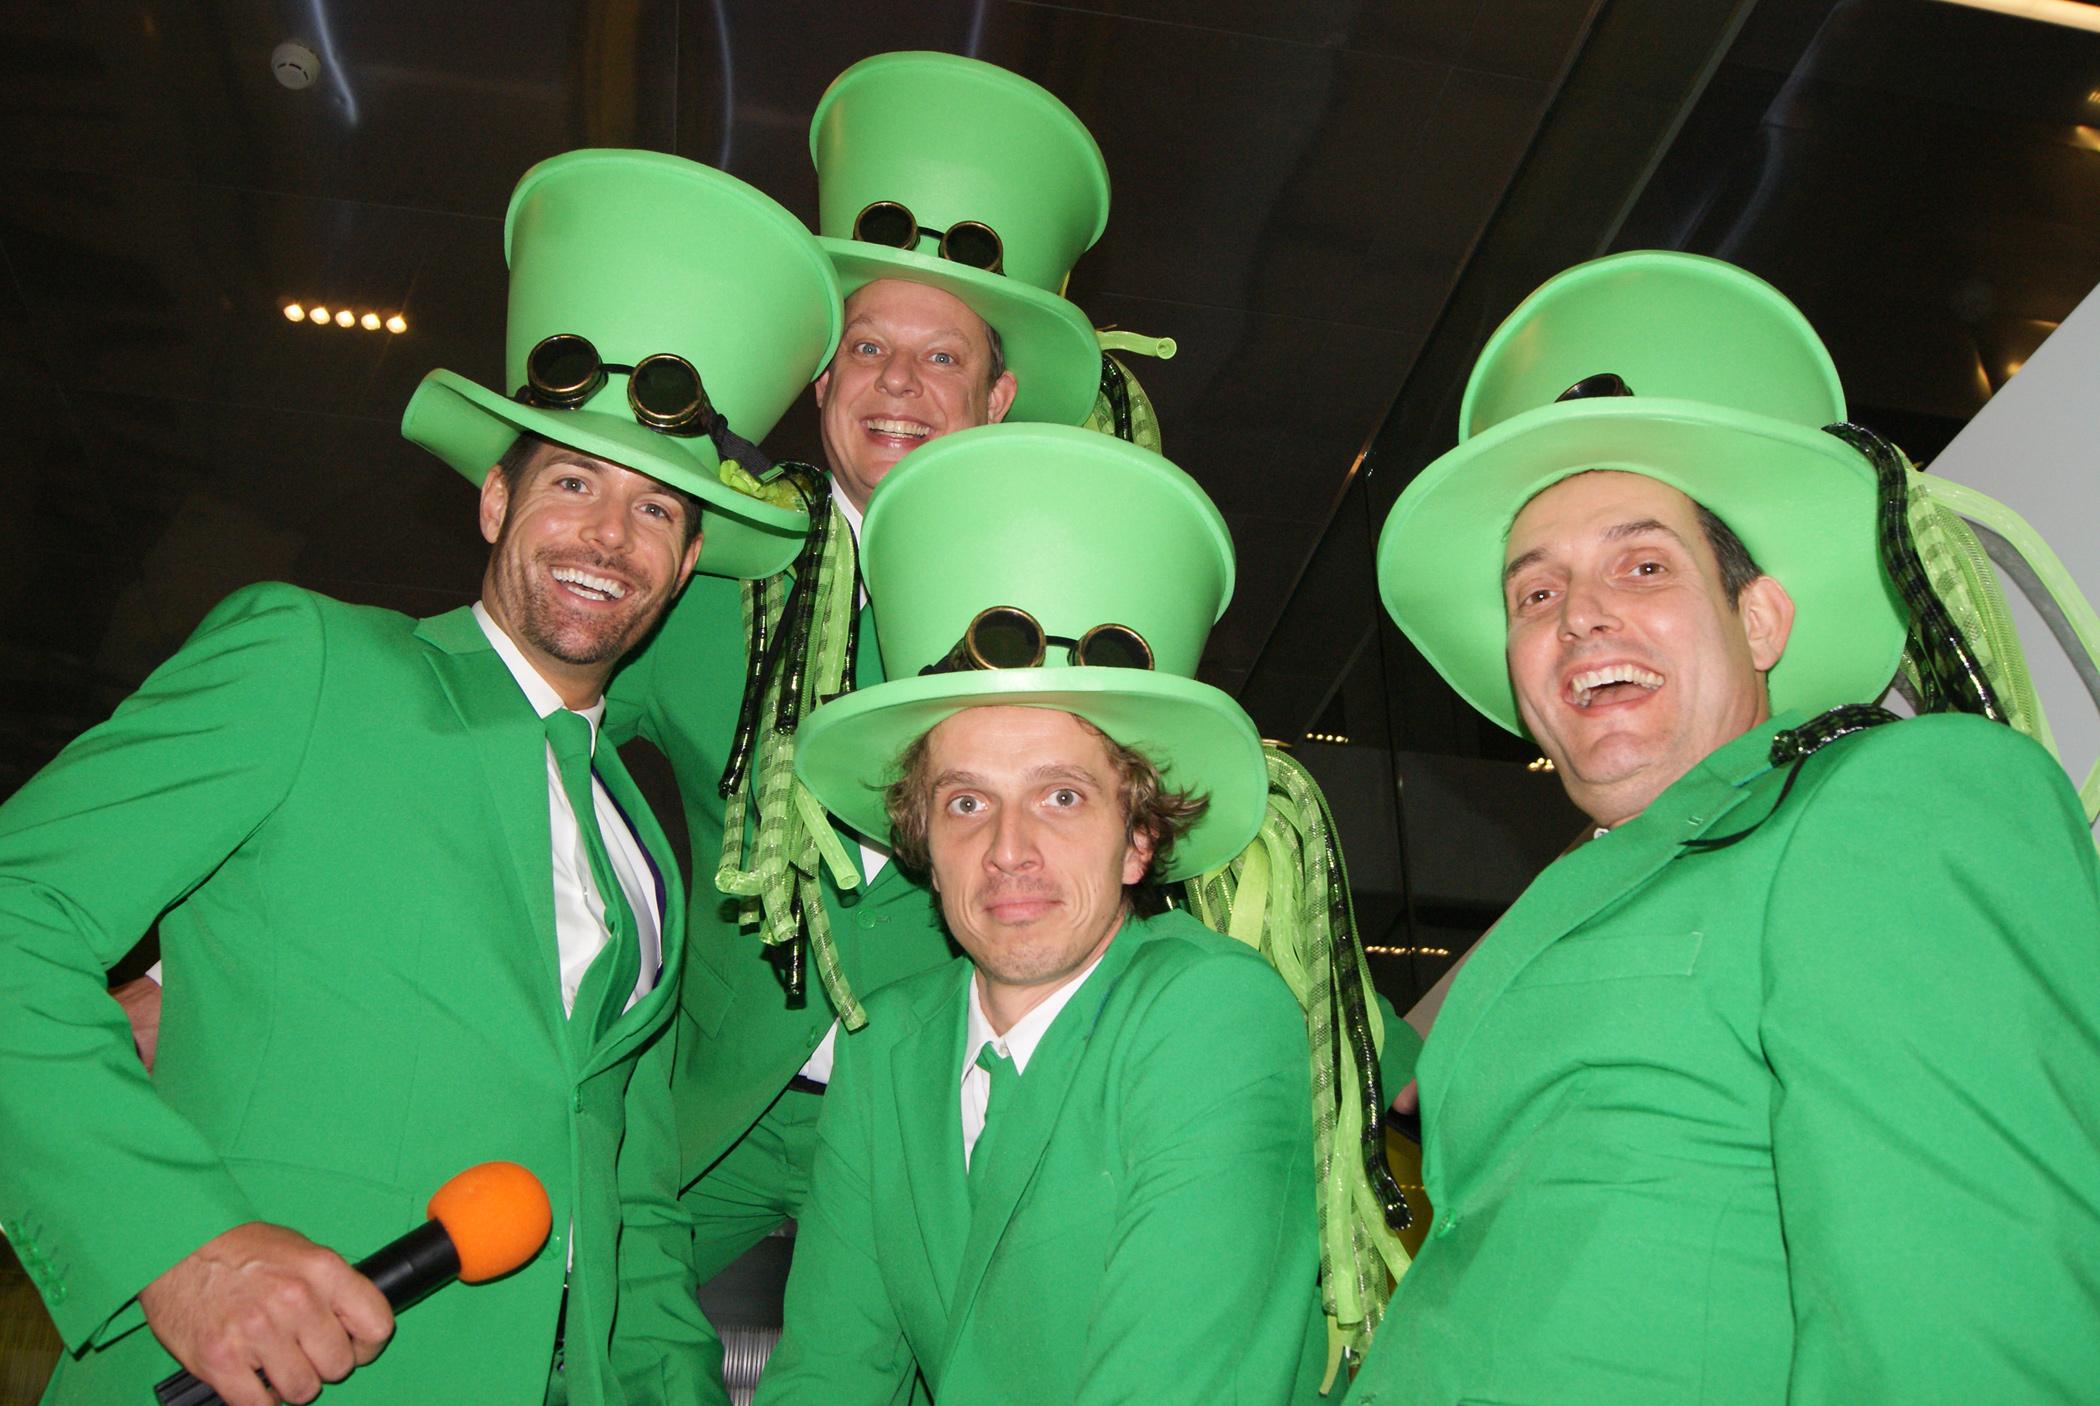 Duurzame groene mannen bij het Ministerie